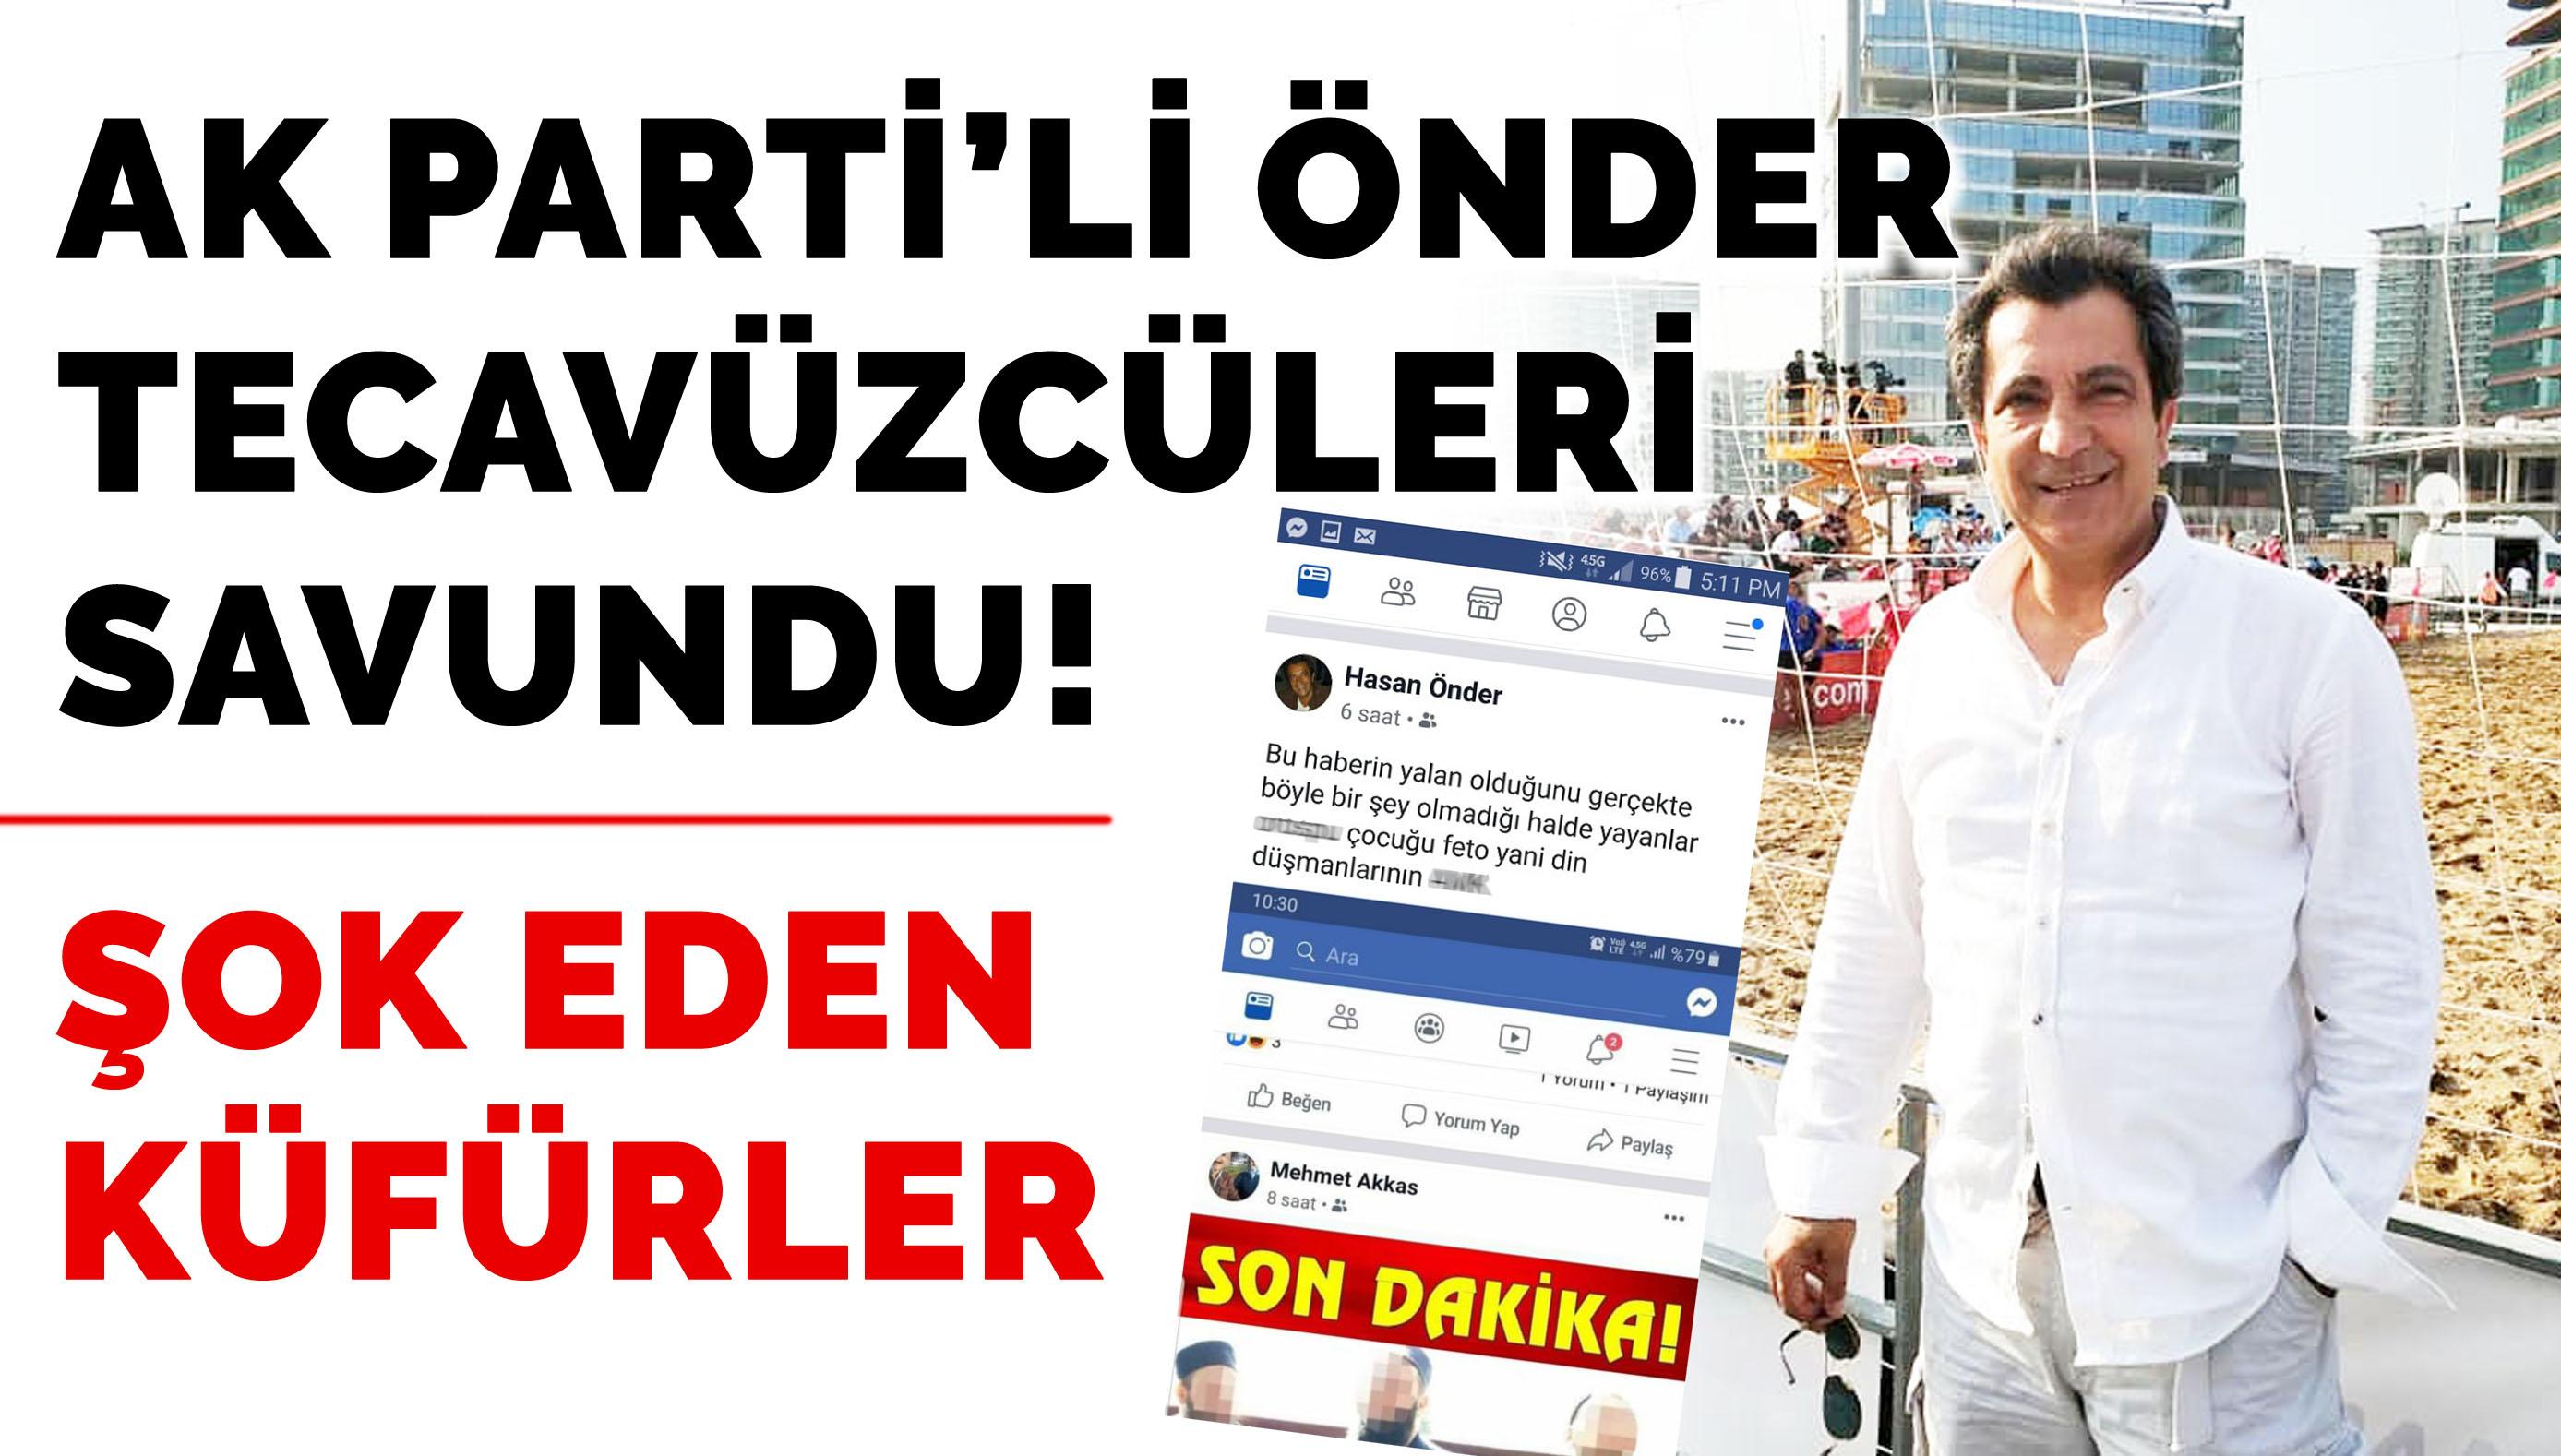 AK PARTİ'Lİ ÖNDER TECAVÜZCÜLERİ SAVUNDU!